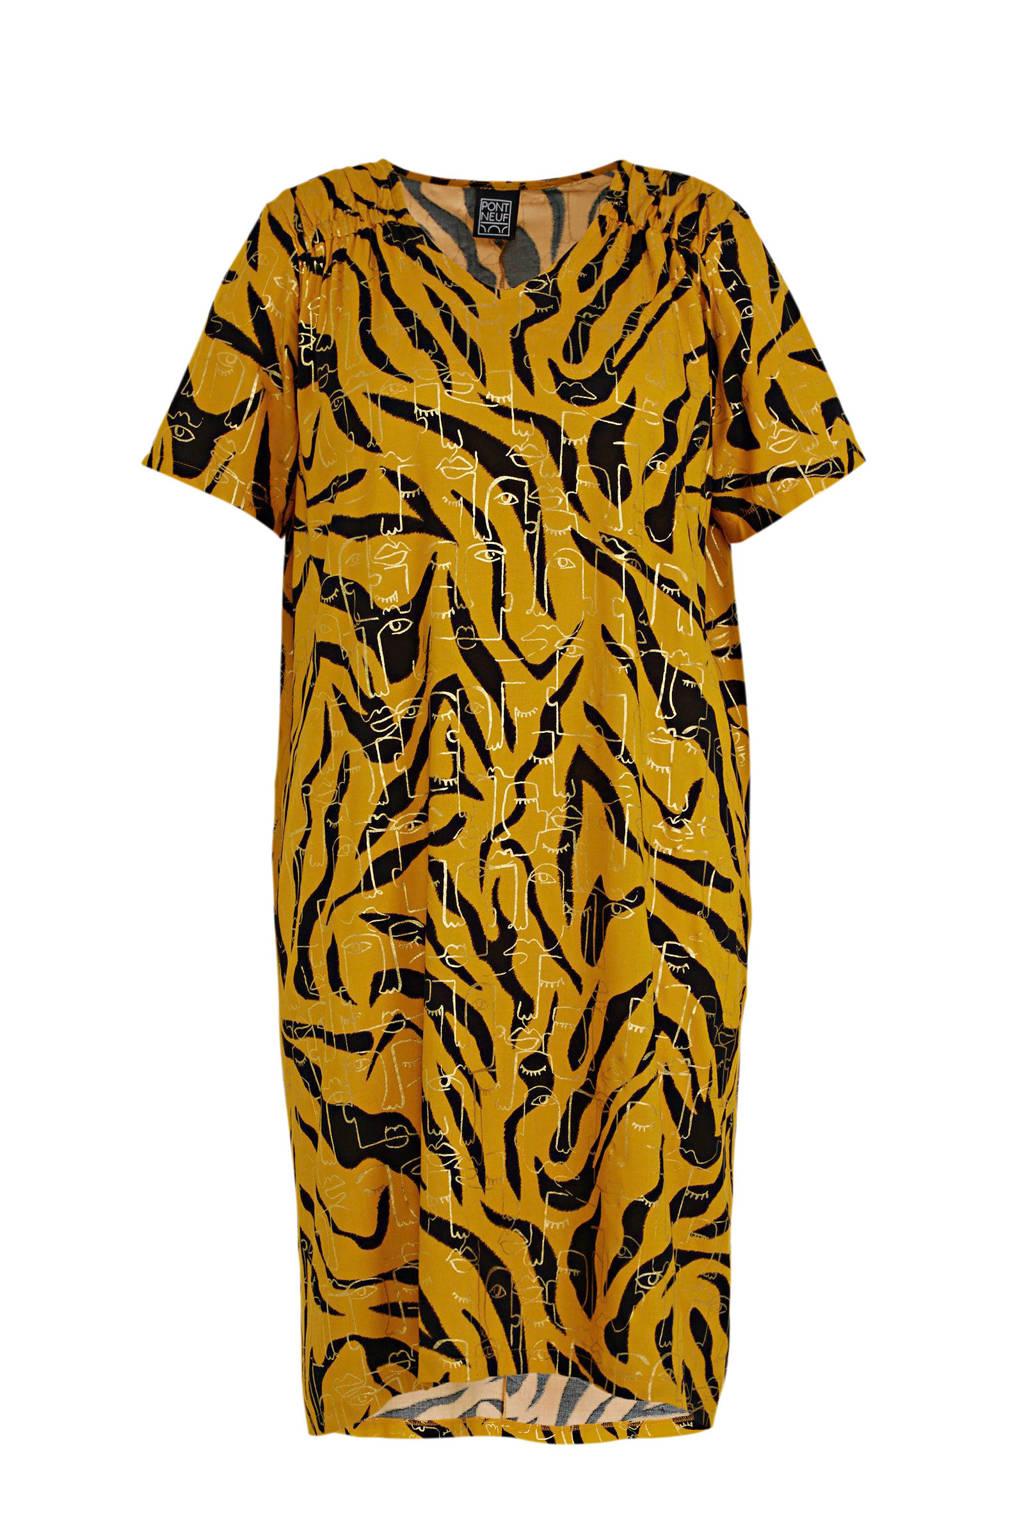 PONT NEUF jurk Ally met all over print geel/zwart, Geel/zwart